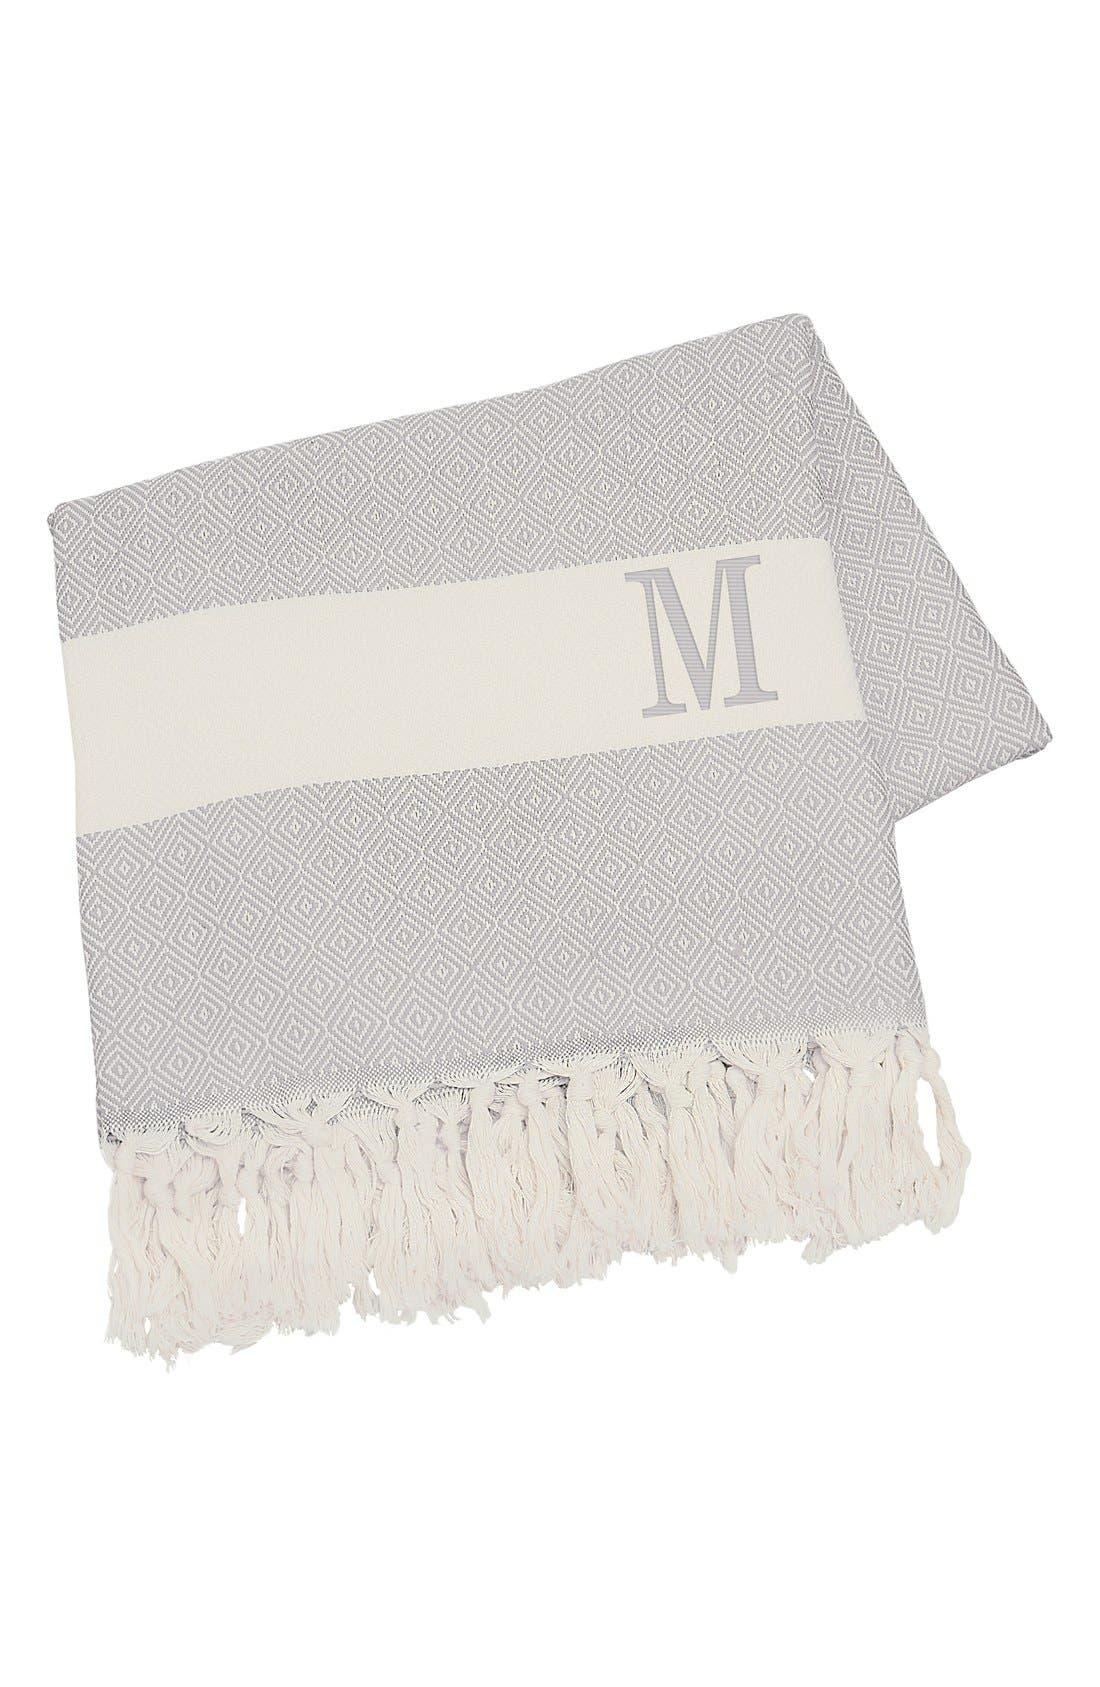 Monogram Turkish Cotton Throw,                             Main thumbnail 1, color,                             Grey - M